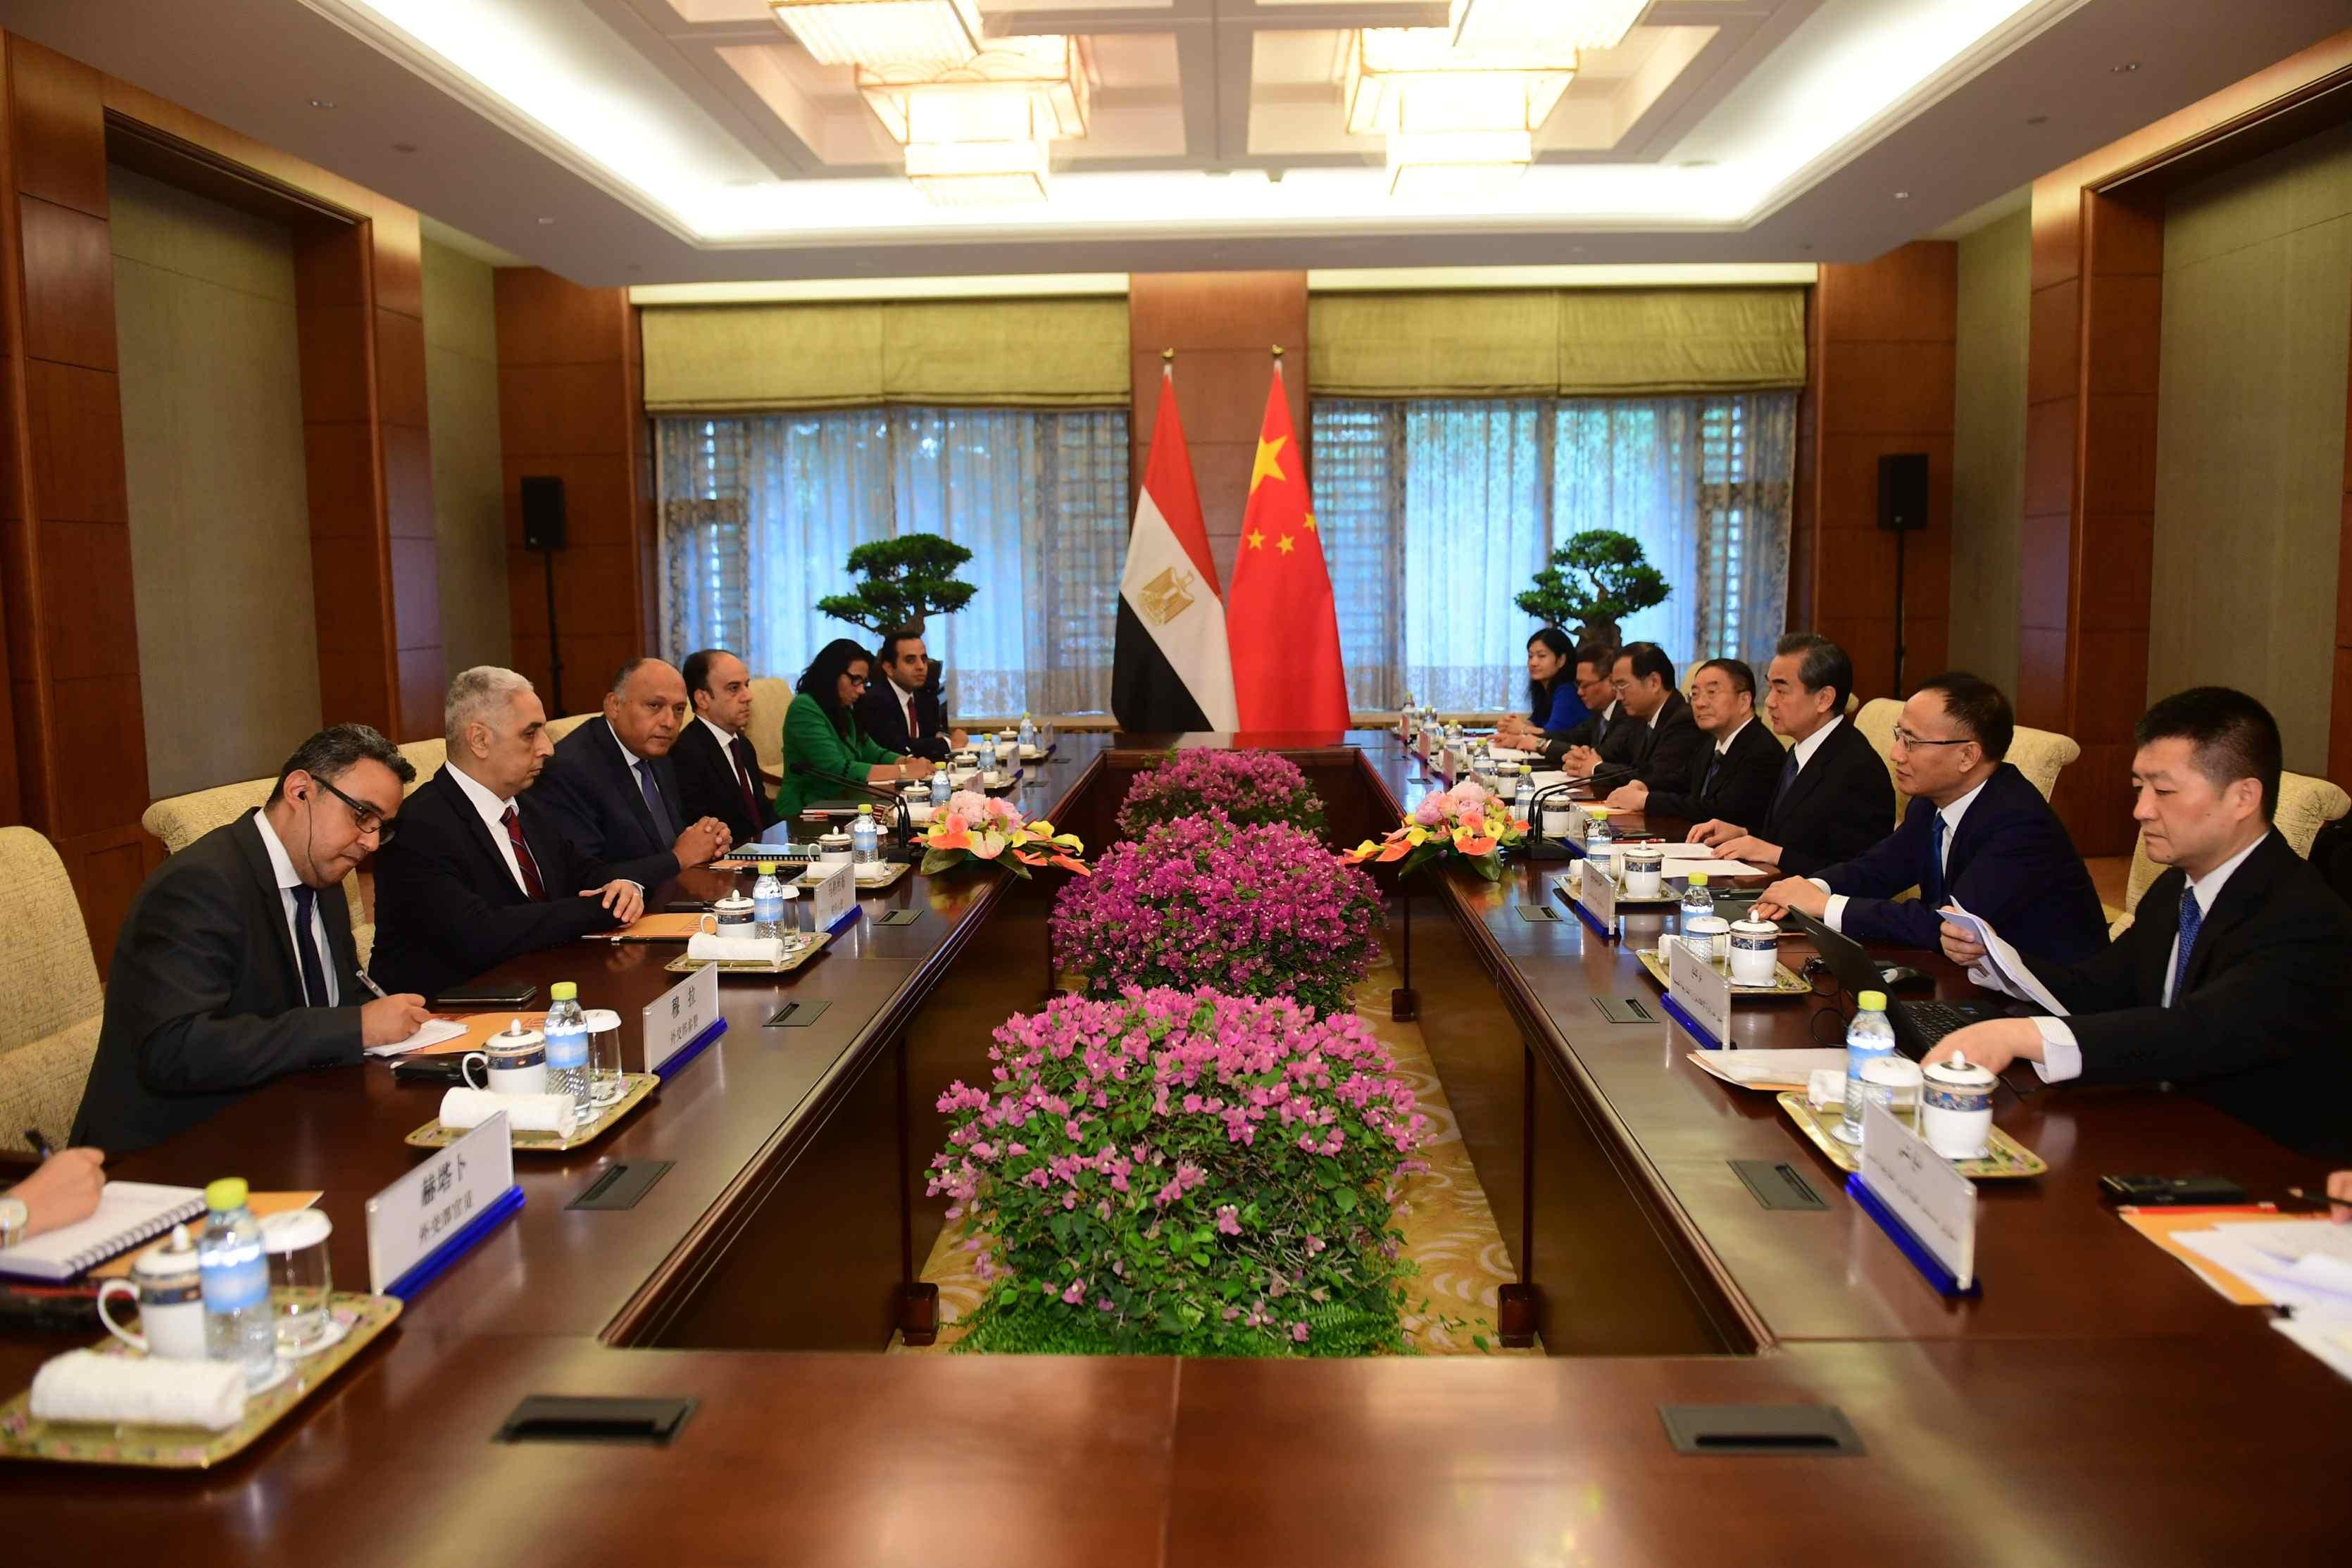 Wang Yi: China values the important influence of Egypt